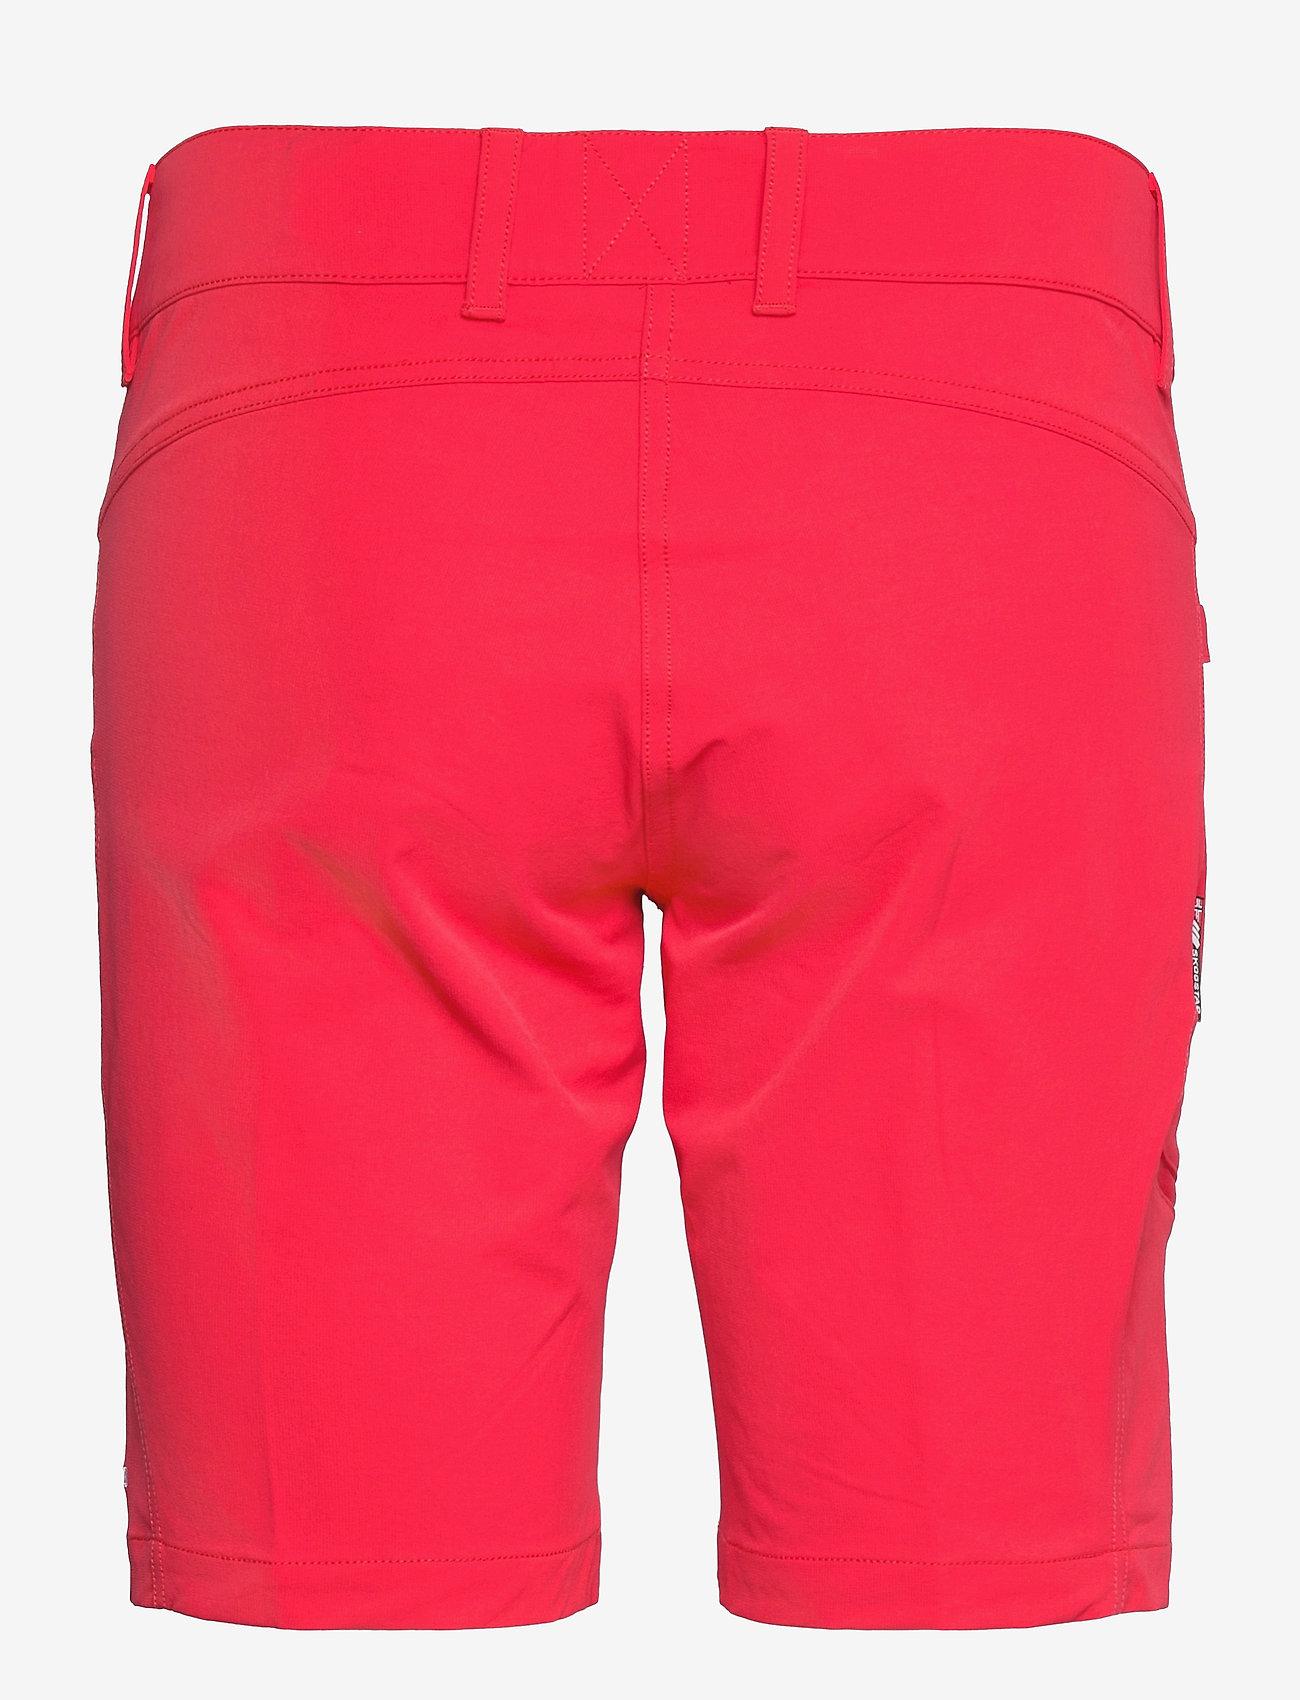 Skogstad - Veotinden   Shorts - chaussures de course - hibiscus red - 1